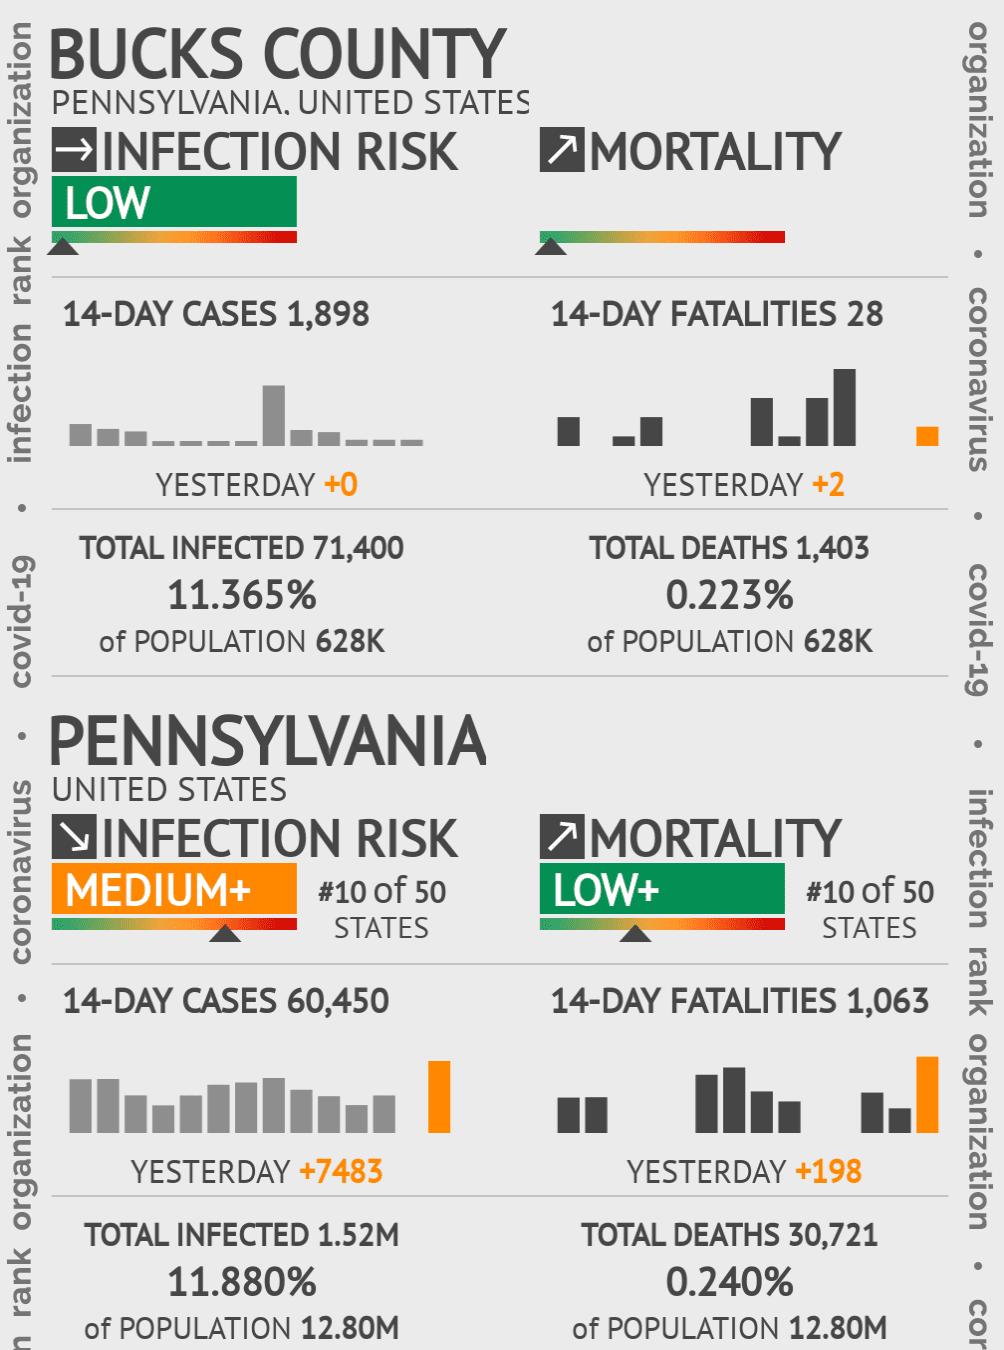 Bucks County Coronavirus Covid-19 Risk of Infection on October 22, 2020